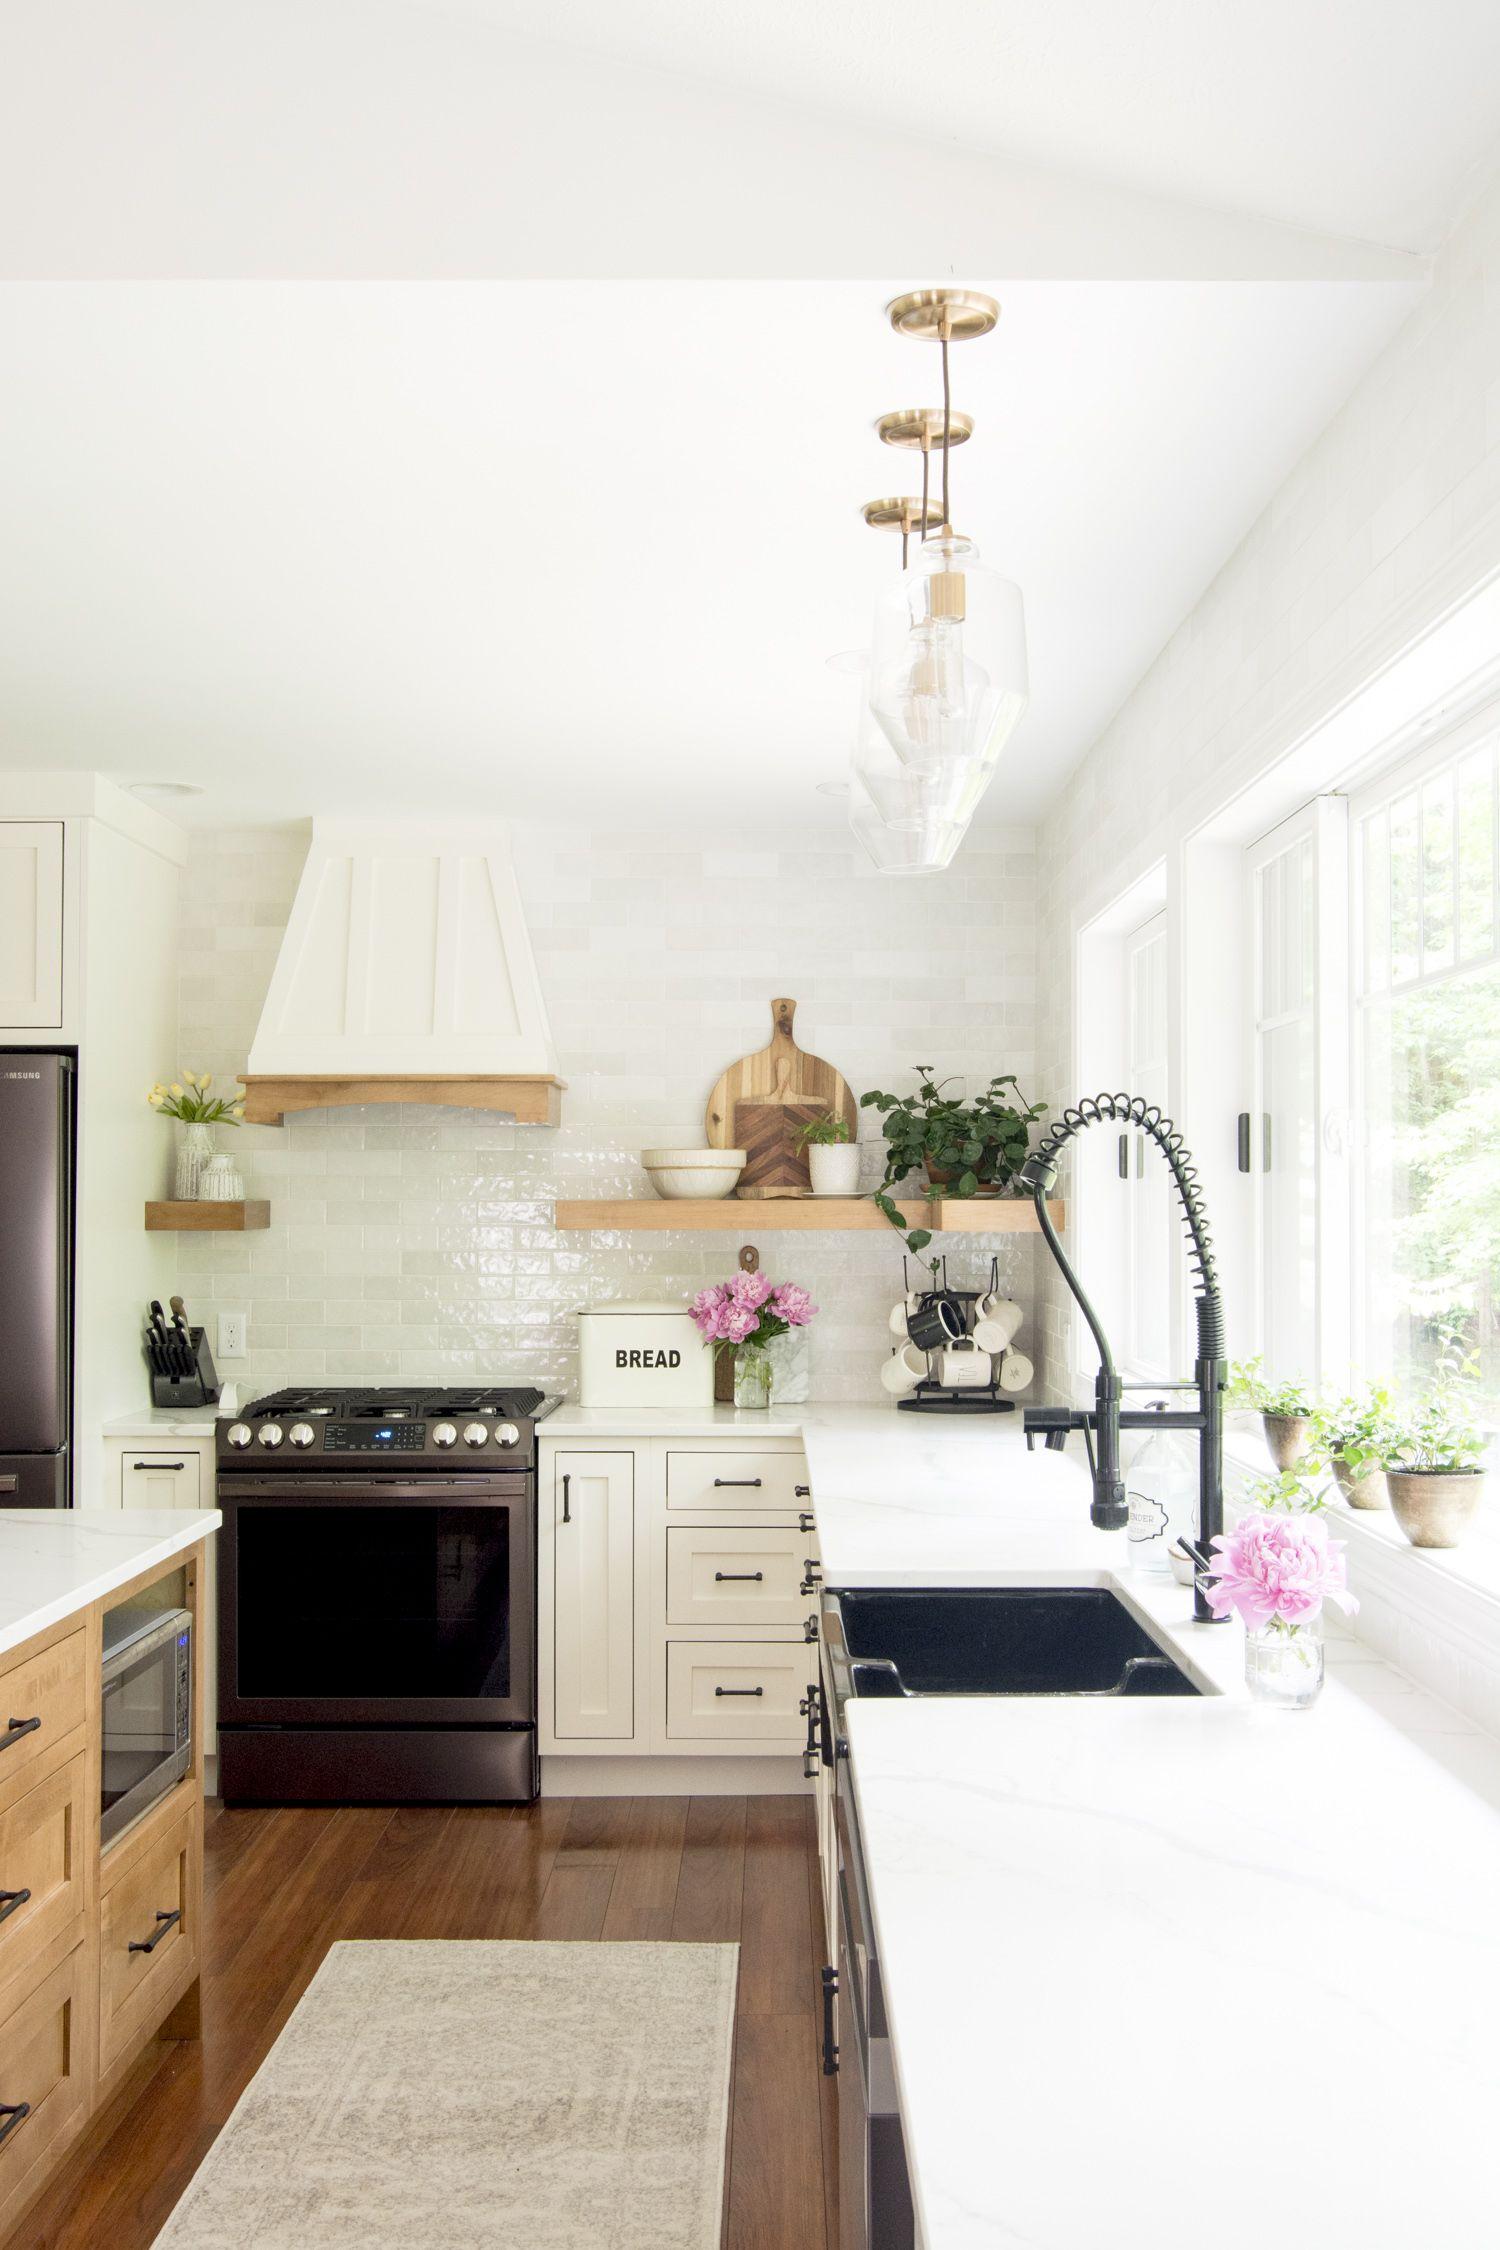 Summer Kitchen Decor Ideas Stainless Steel Kitchen Decor Country Kitchen Decor Kitchen Decor Modern